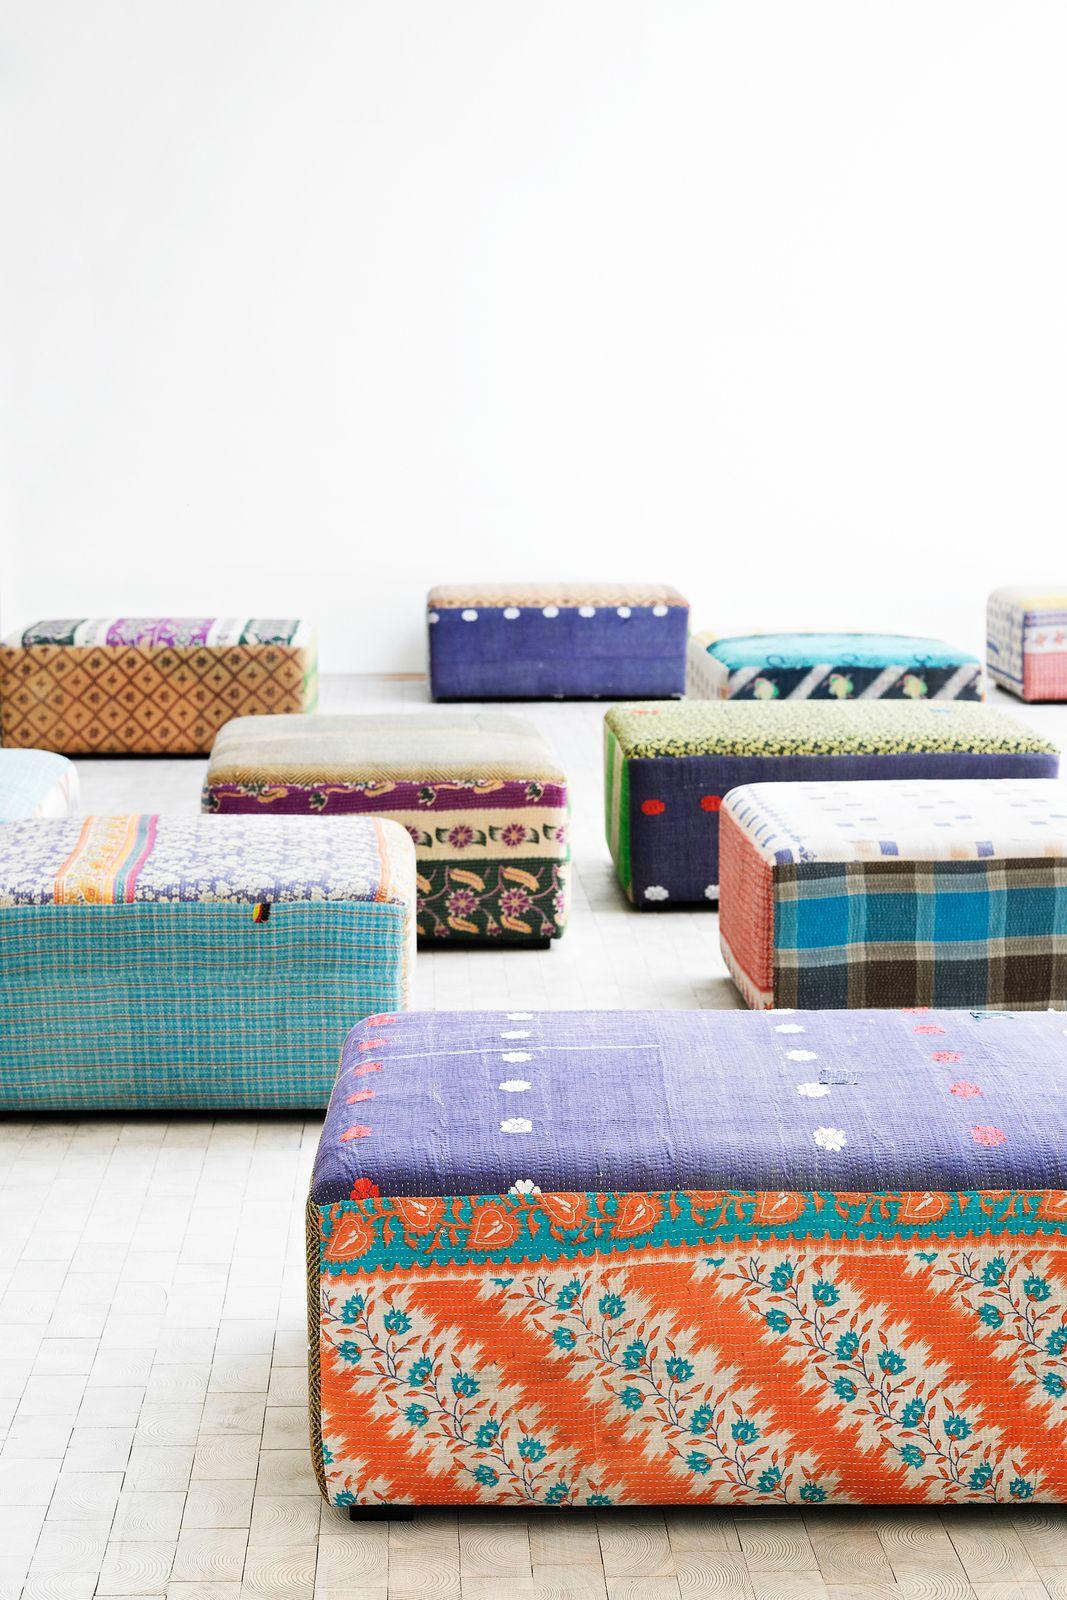 Hay Hocker hocker mags antique quilt ottoman 5 linen blanket rug